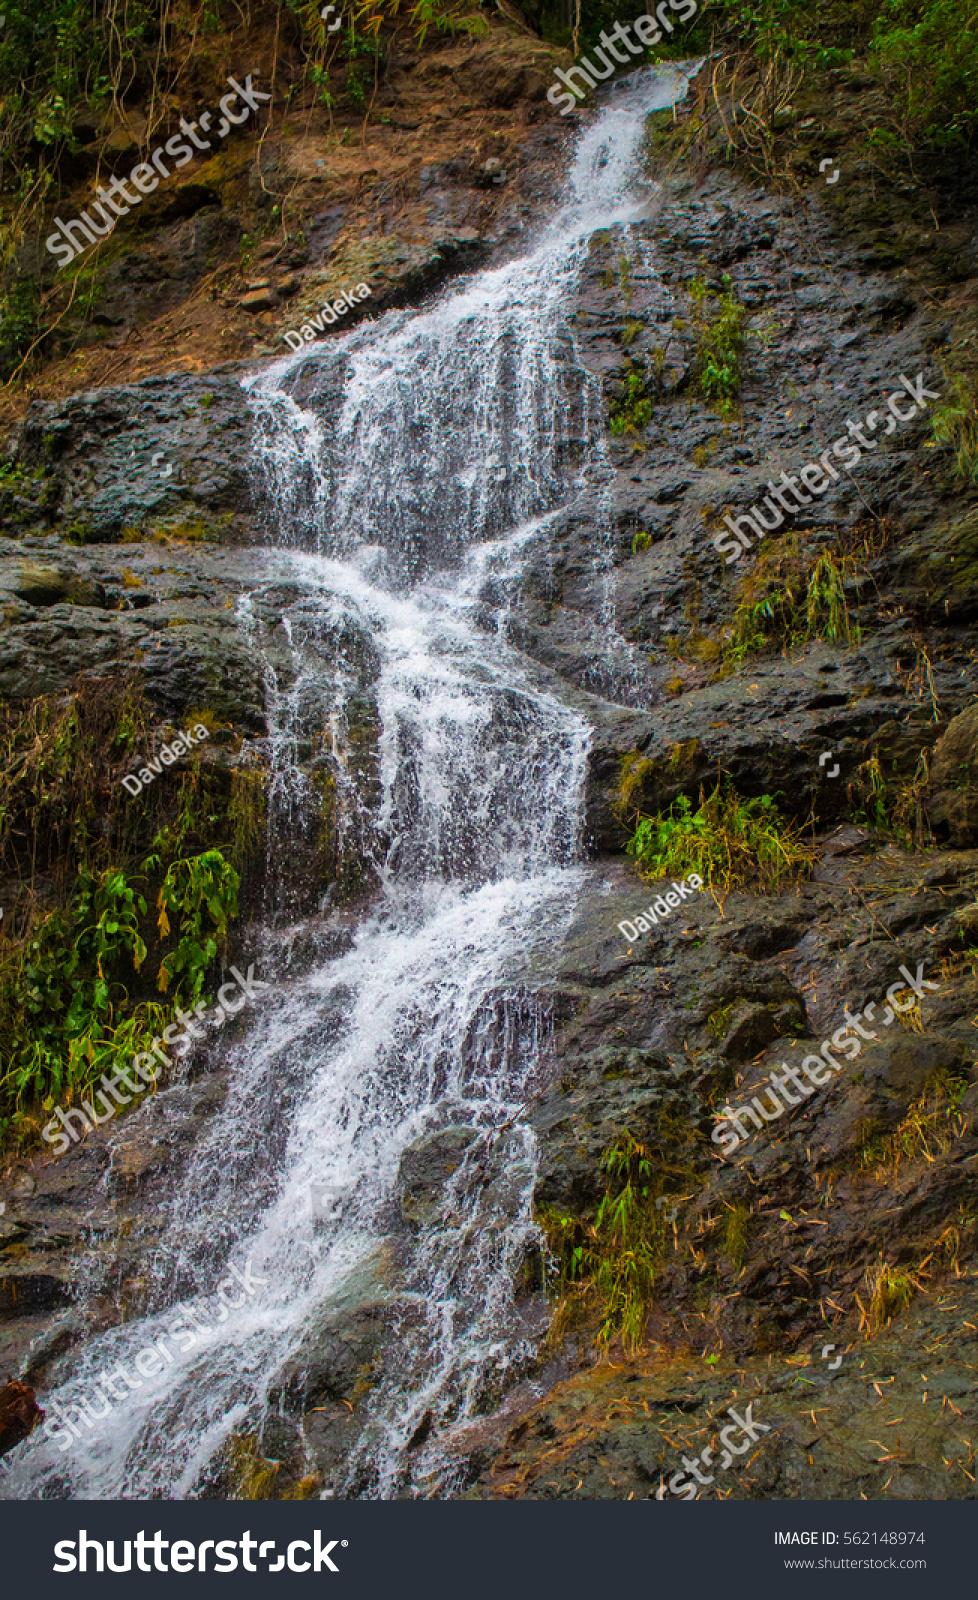 Tall waterfall on mountain waterfall stream stock photo for Waterfall environment